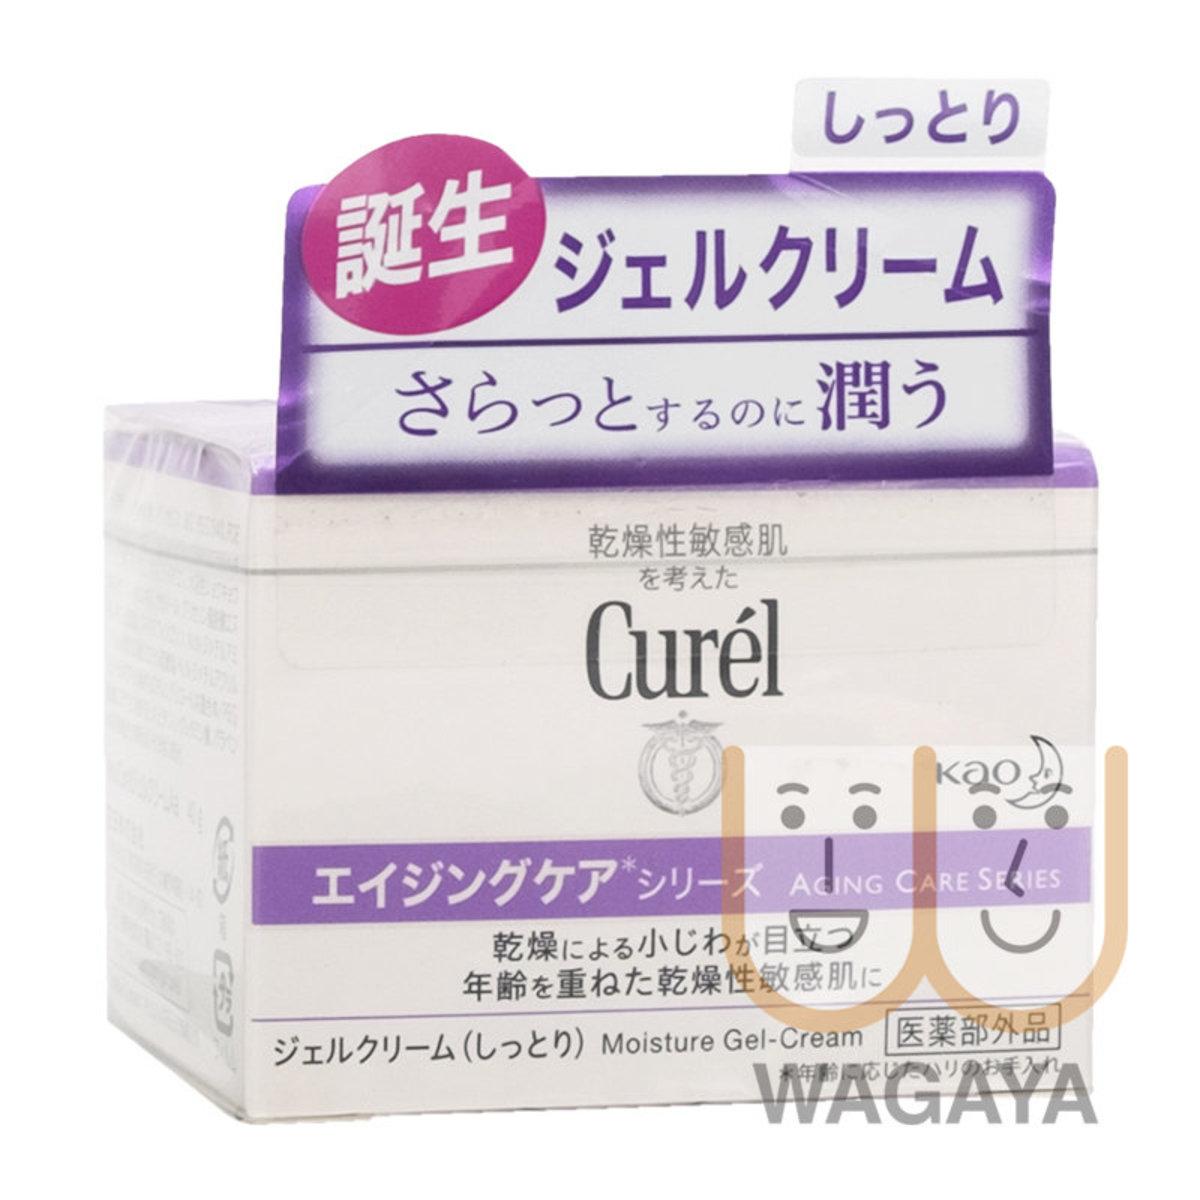 Aging Care Series Moisture Gel Cream (Purple) 40g (4901301334527) (Parallel Import)